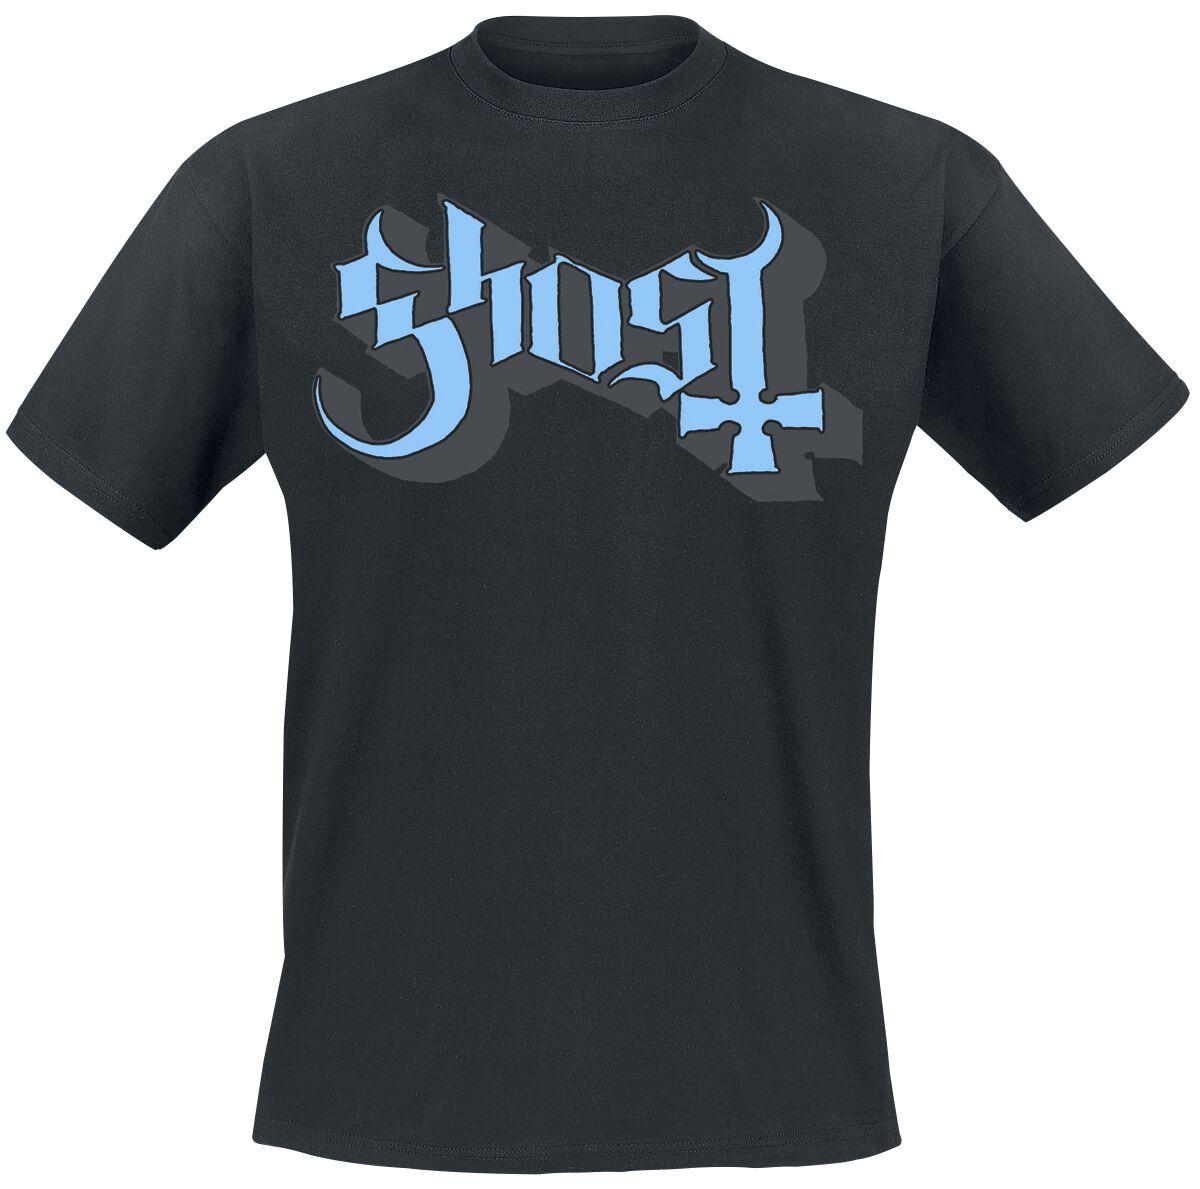 Zespoły - Koszulki - T-Shirt Ghost Blue Logo T-Shirt czarny - 359905